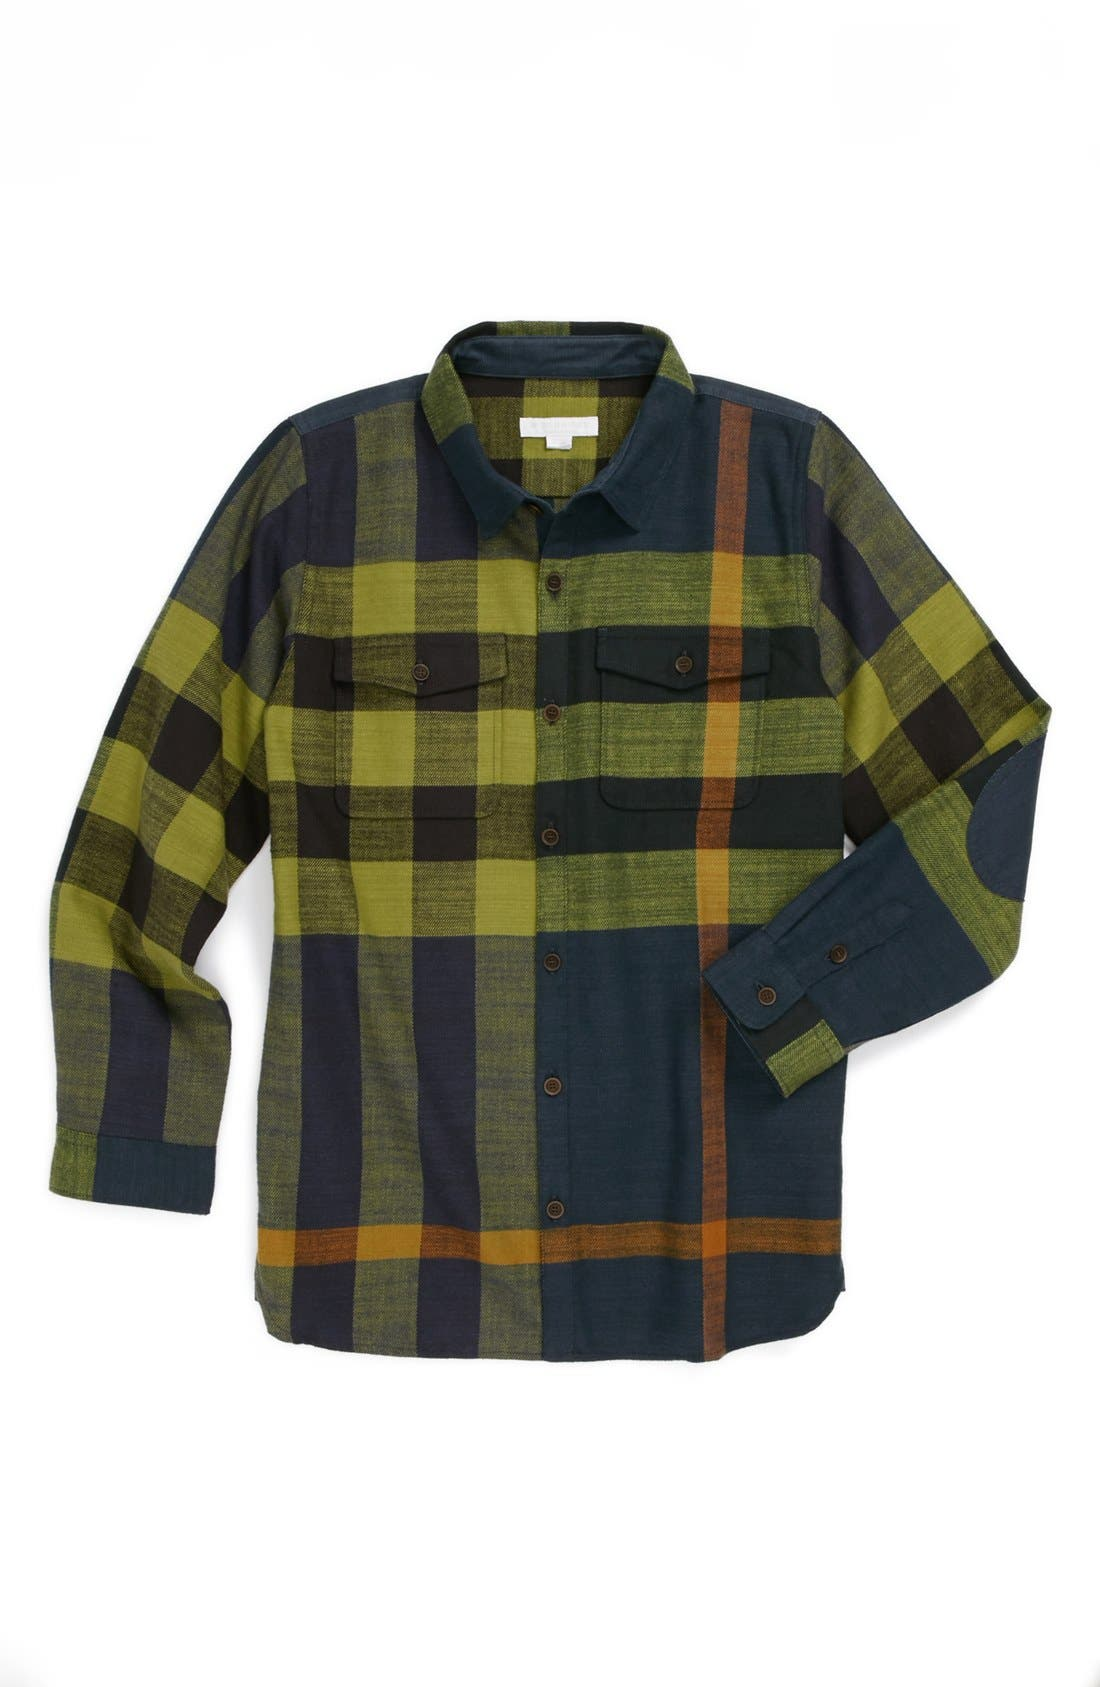 Alternate Image 1 Selected - Burberry 'Endell' Flannel Shirt (Little Boys & Big Boys)